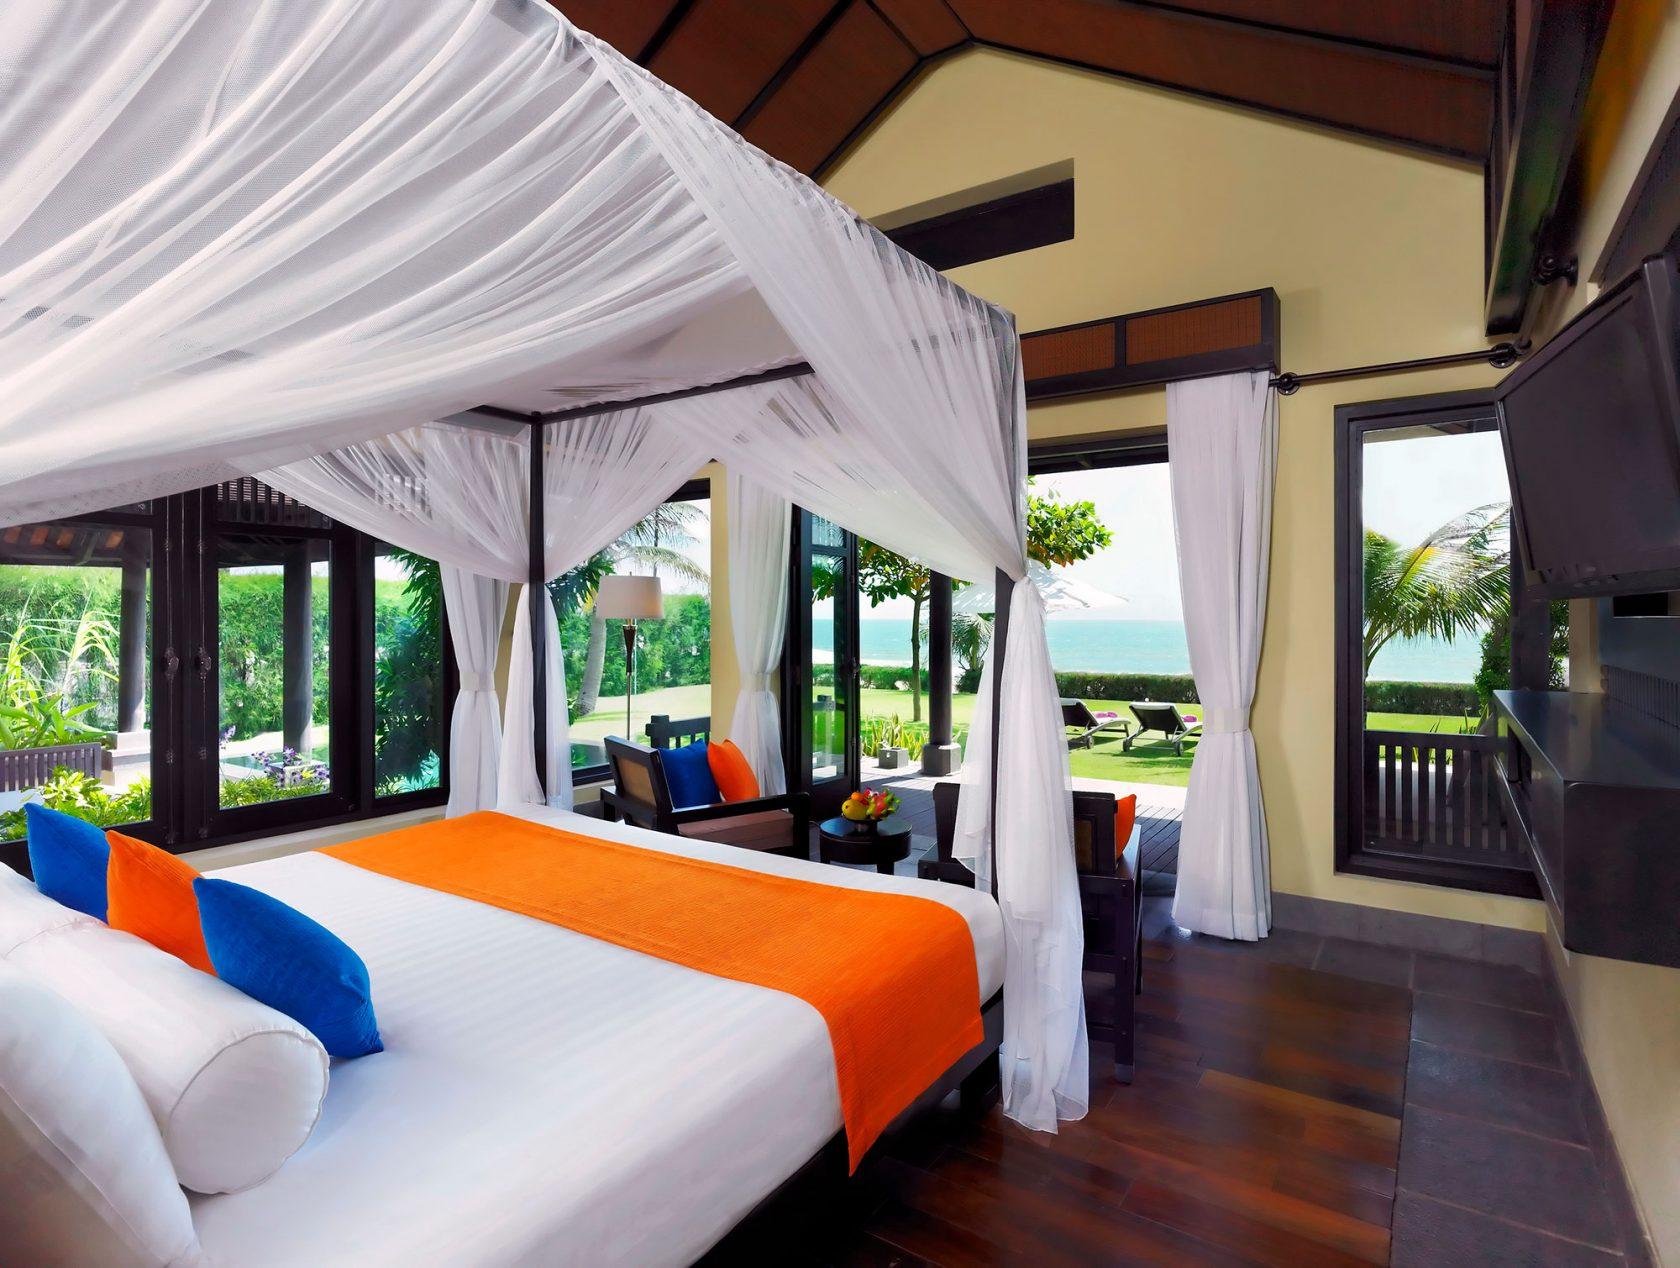 Anantara Mui Ne One Bedroom Beachfront Pool Villa